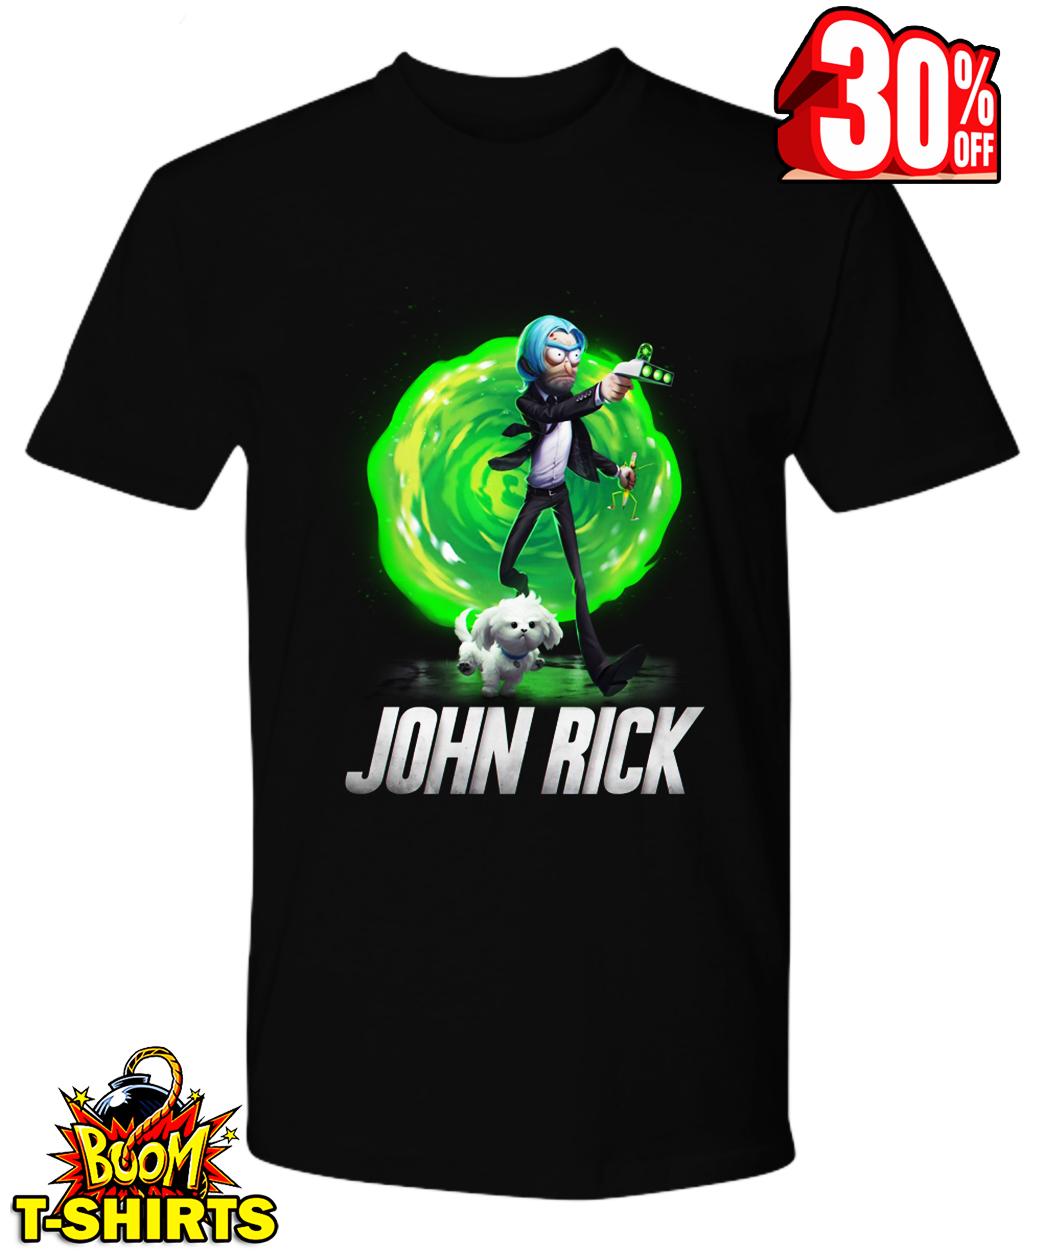 John Rick John Wick Rick and Morty shirt